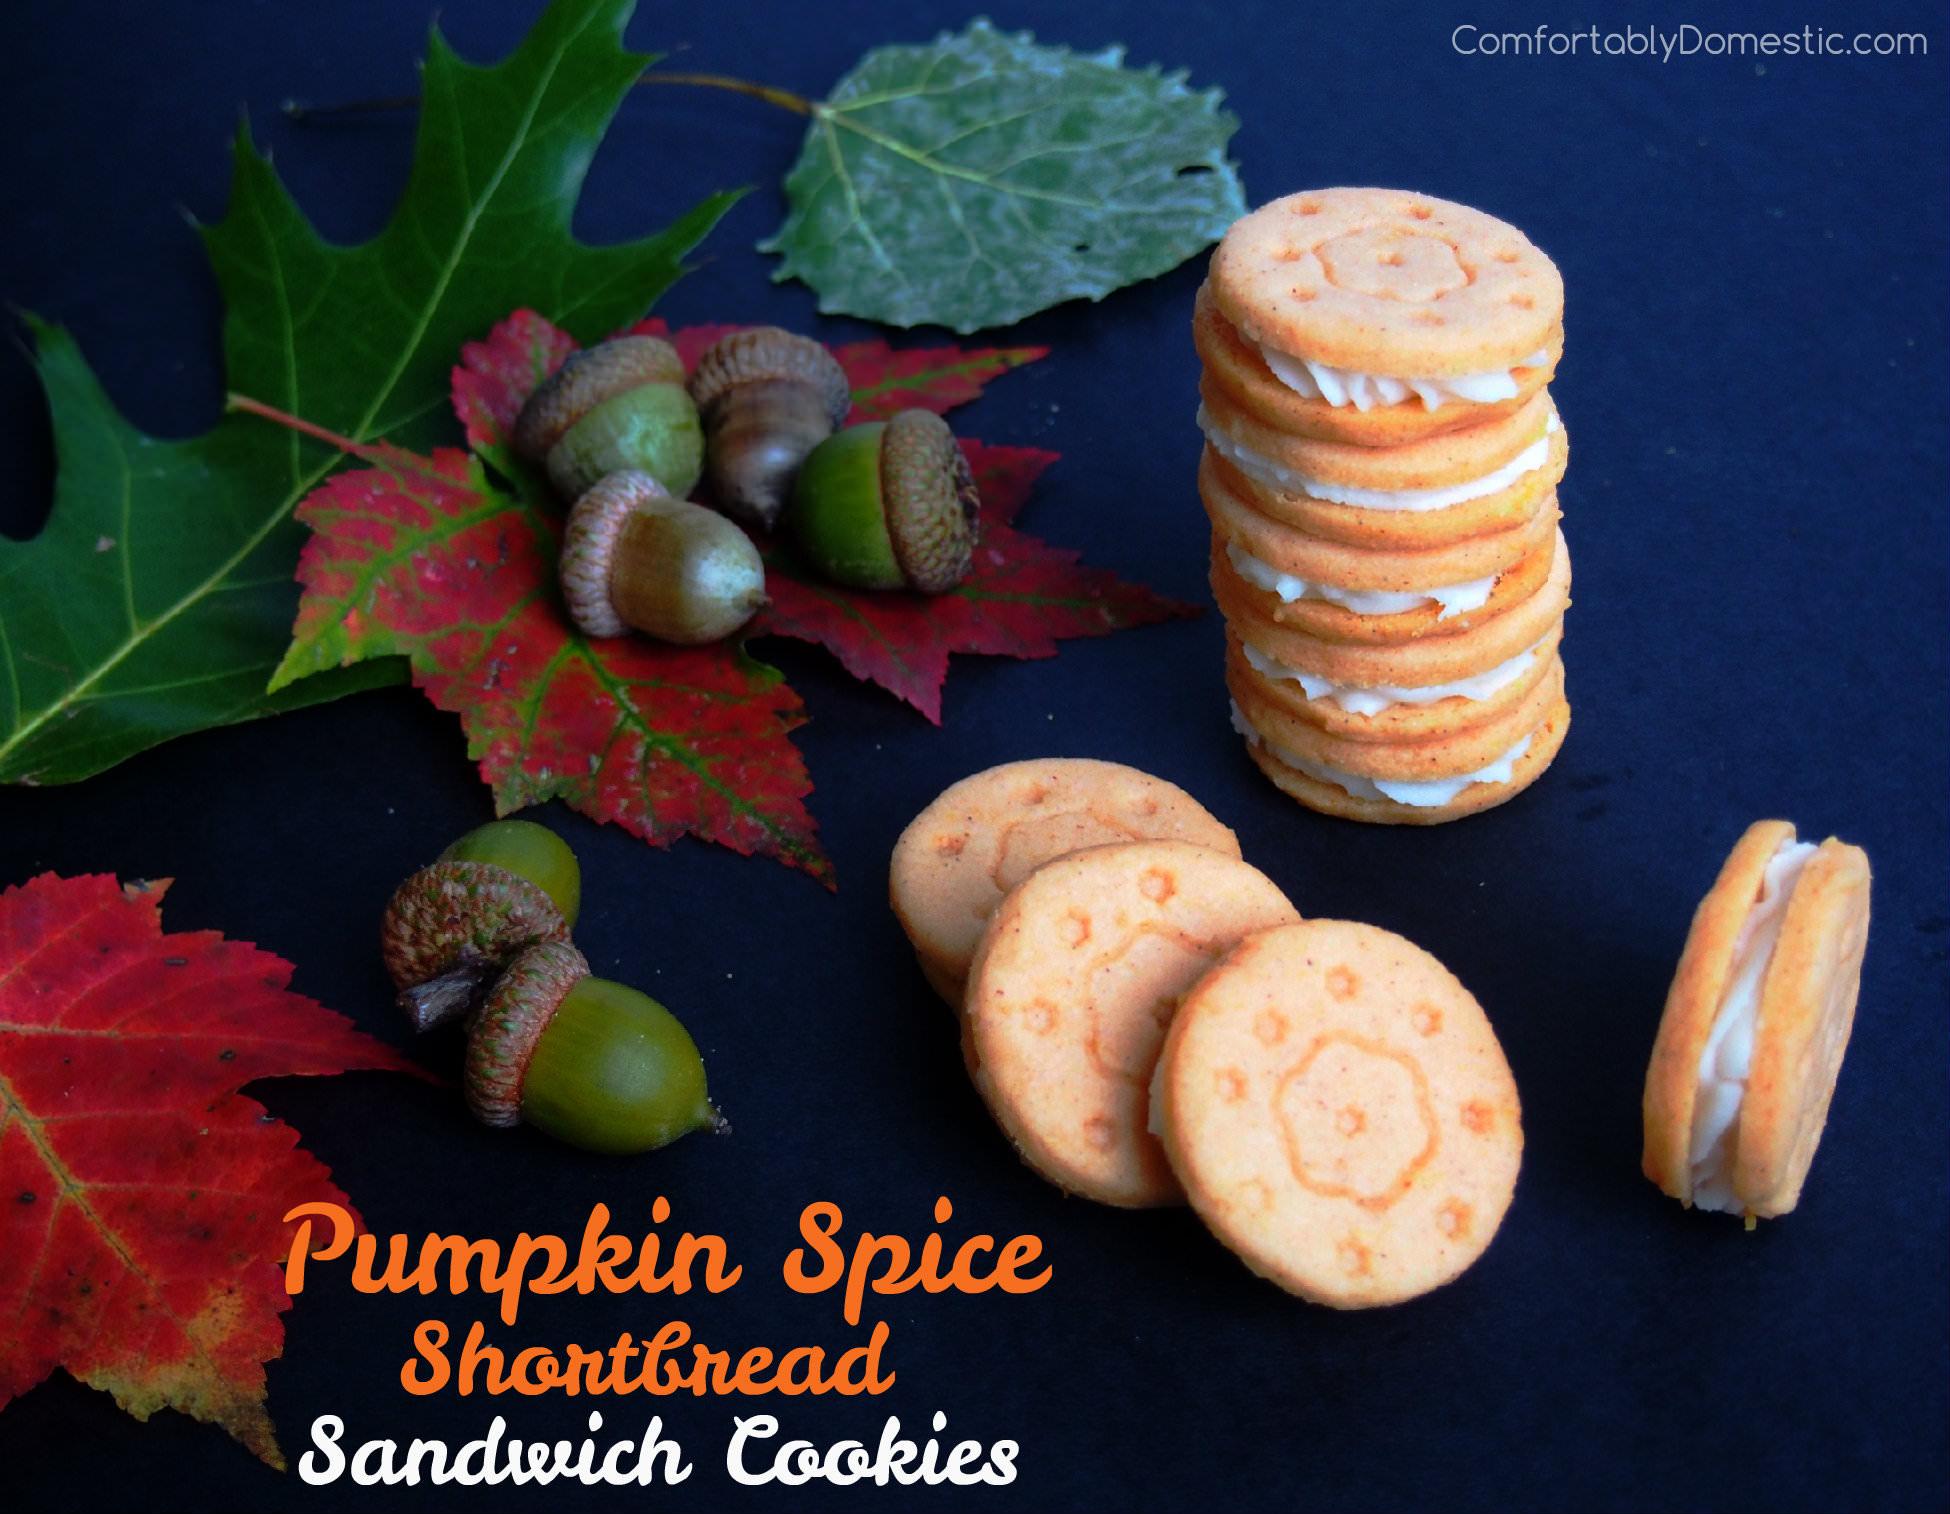 Pumpkin Spice Shortbread Sandwich Cookies | ComfortablyDomestic.com